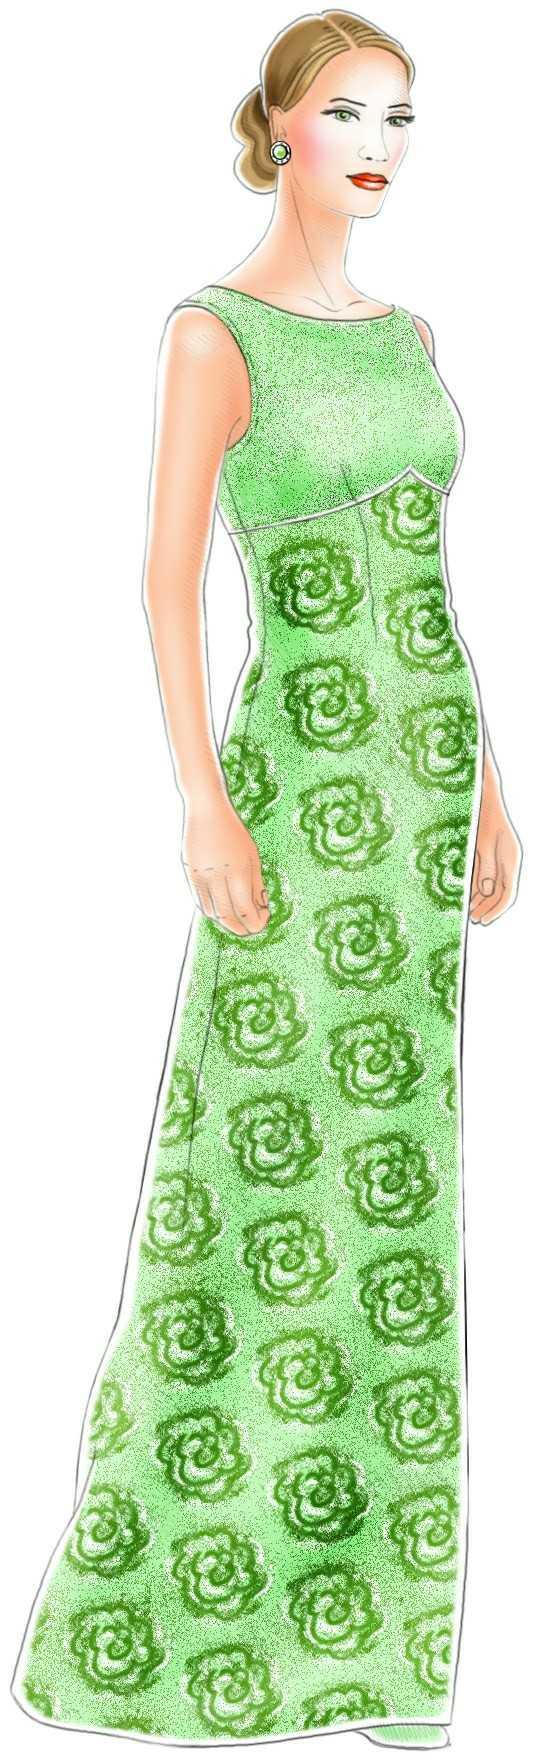 Free wedding dress catalogs  Long Dress  Lekala Fashion Illustration  Pinterest  Sewing